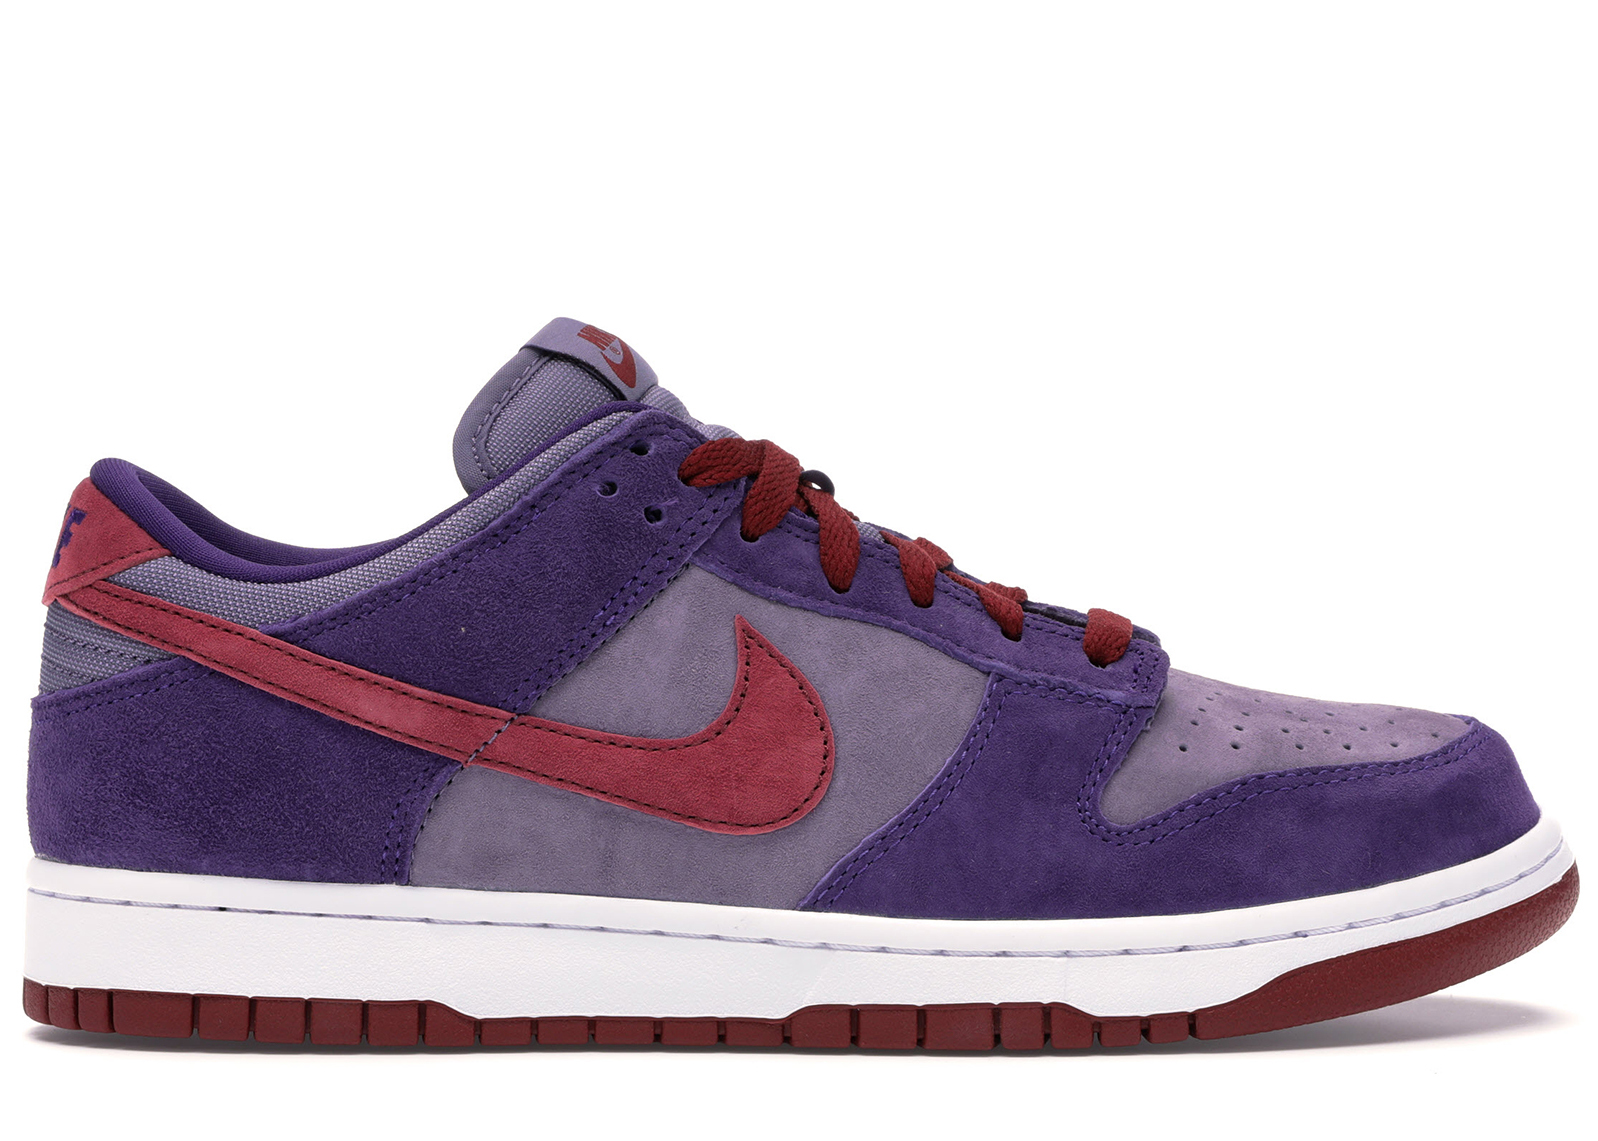 Nike Dunk Low Plum (2020) - CU1726-500